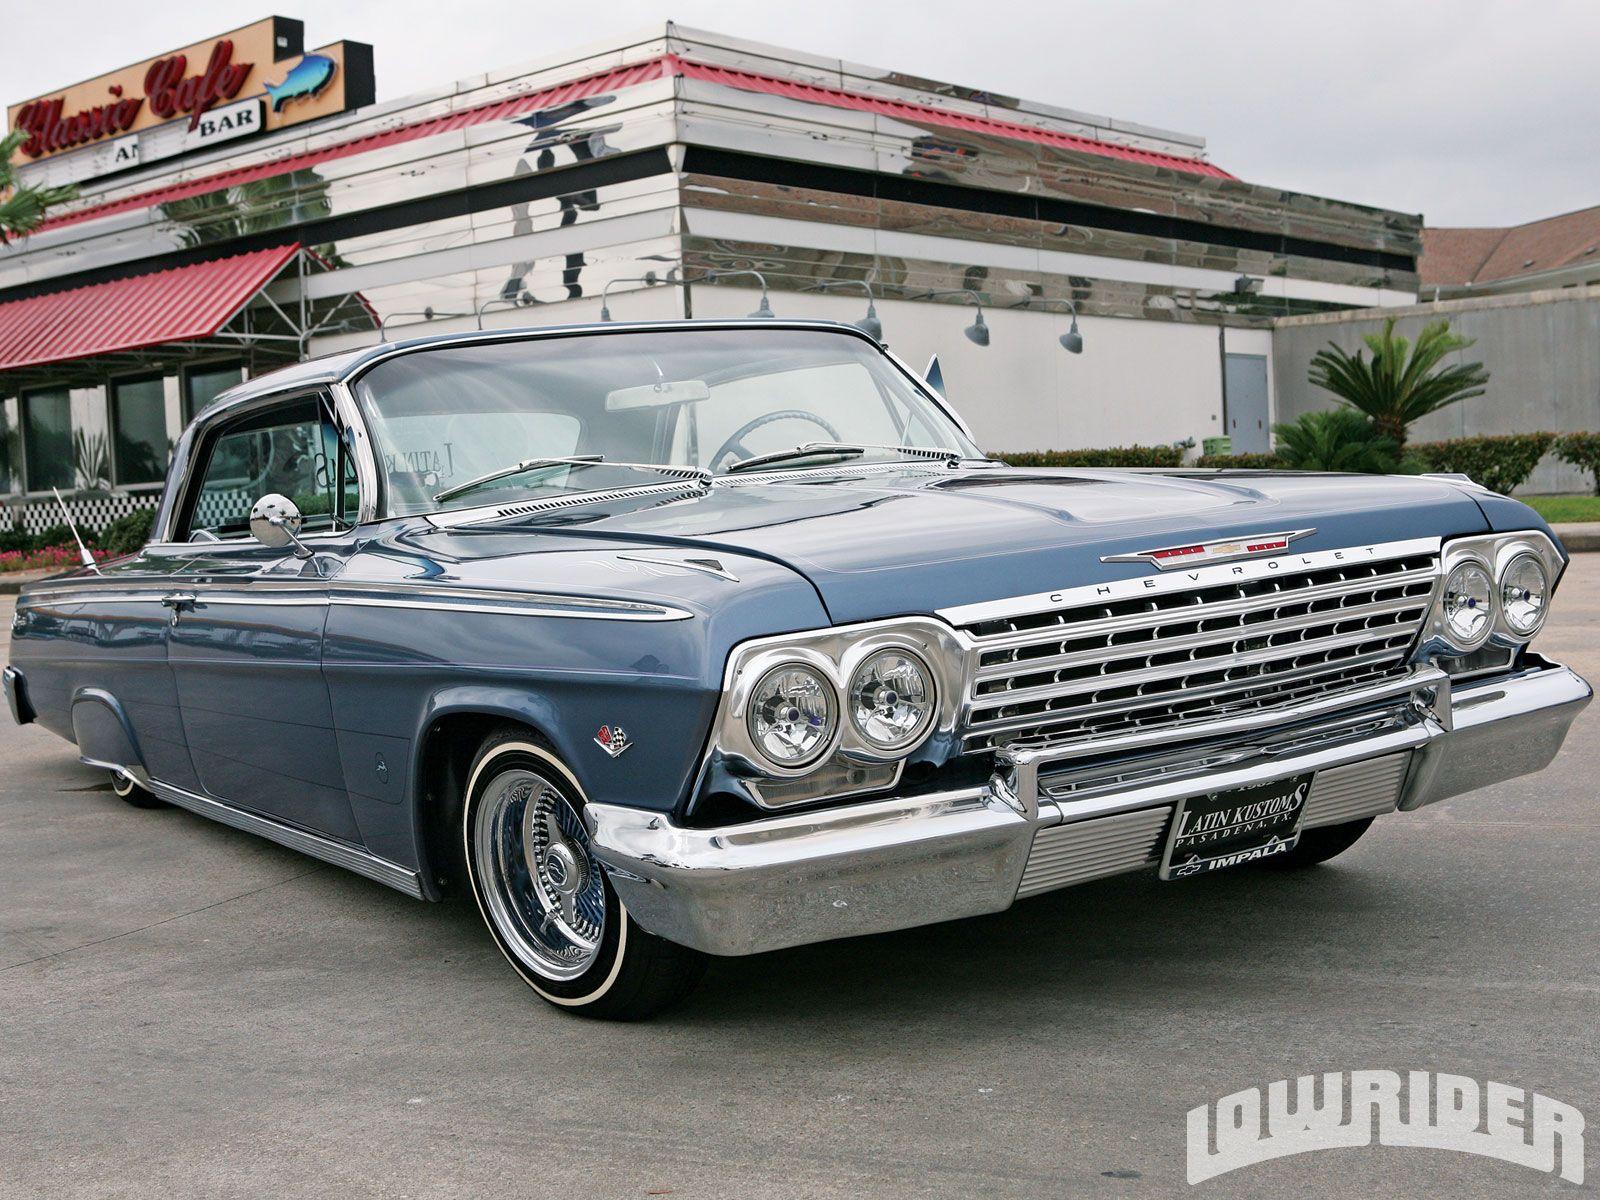 The Best 78 Impala Lowrider